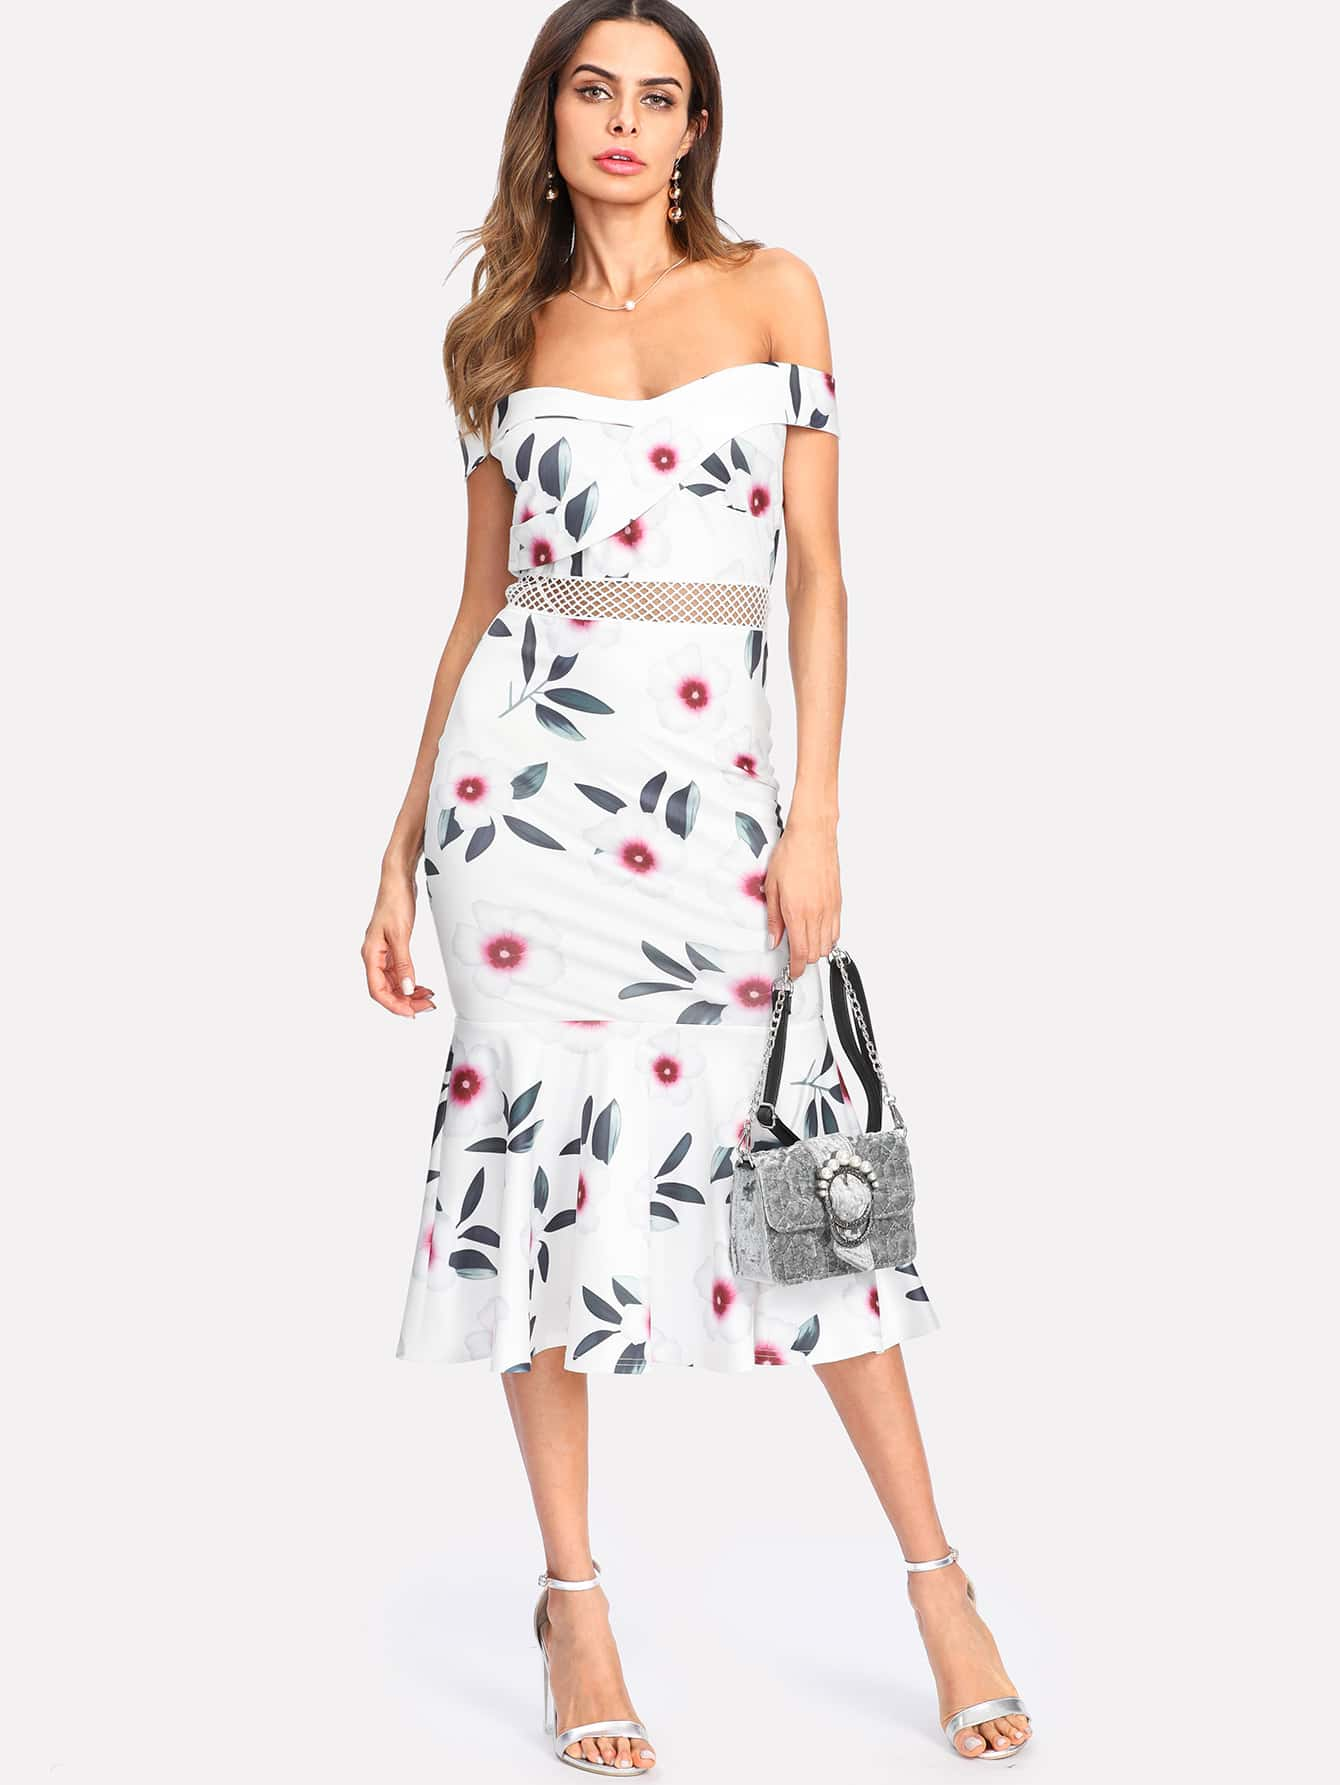 robe floral avec col bateau french shein sheinside. Black Bedroom Furniture Sets. Home Design Ideas